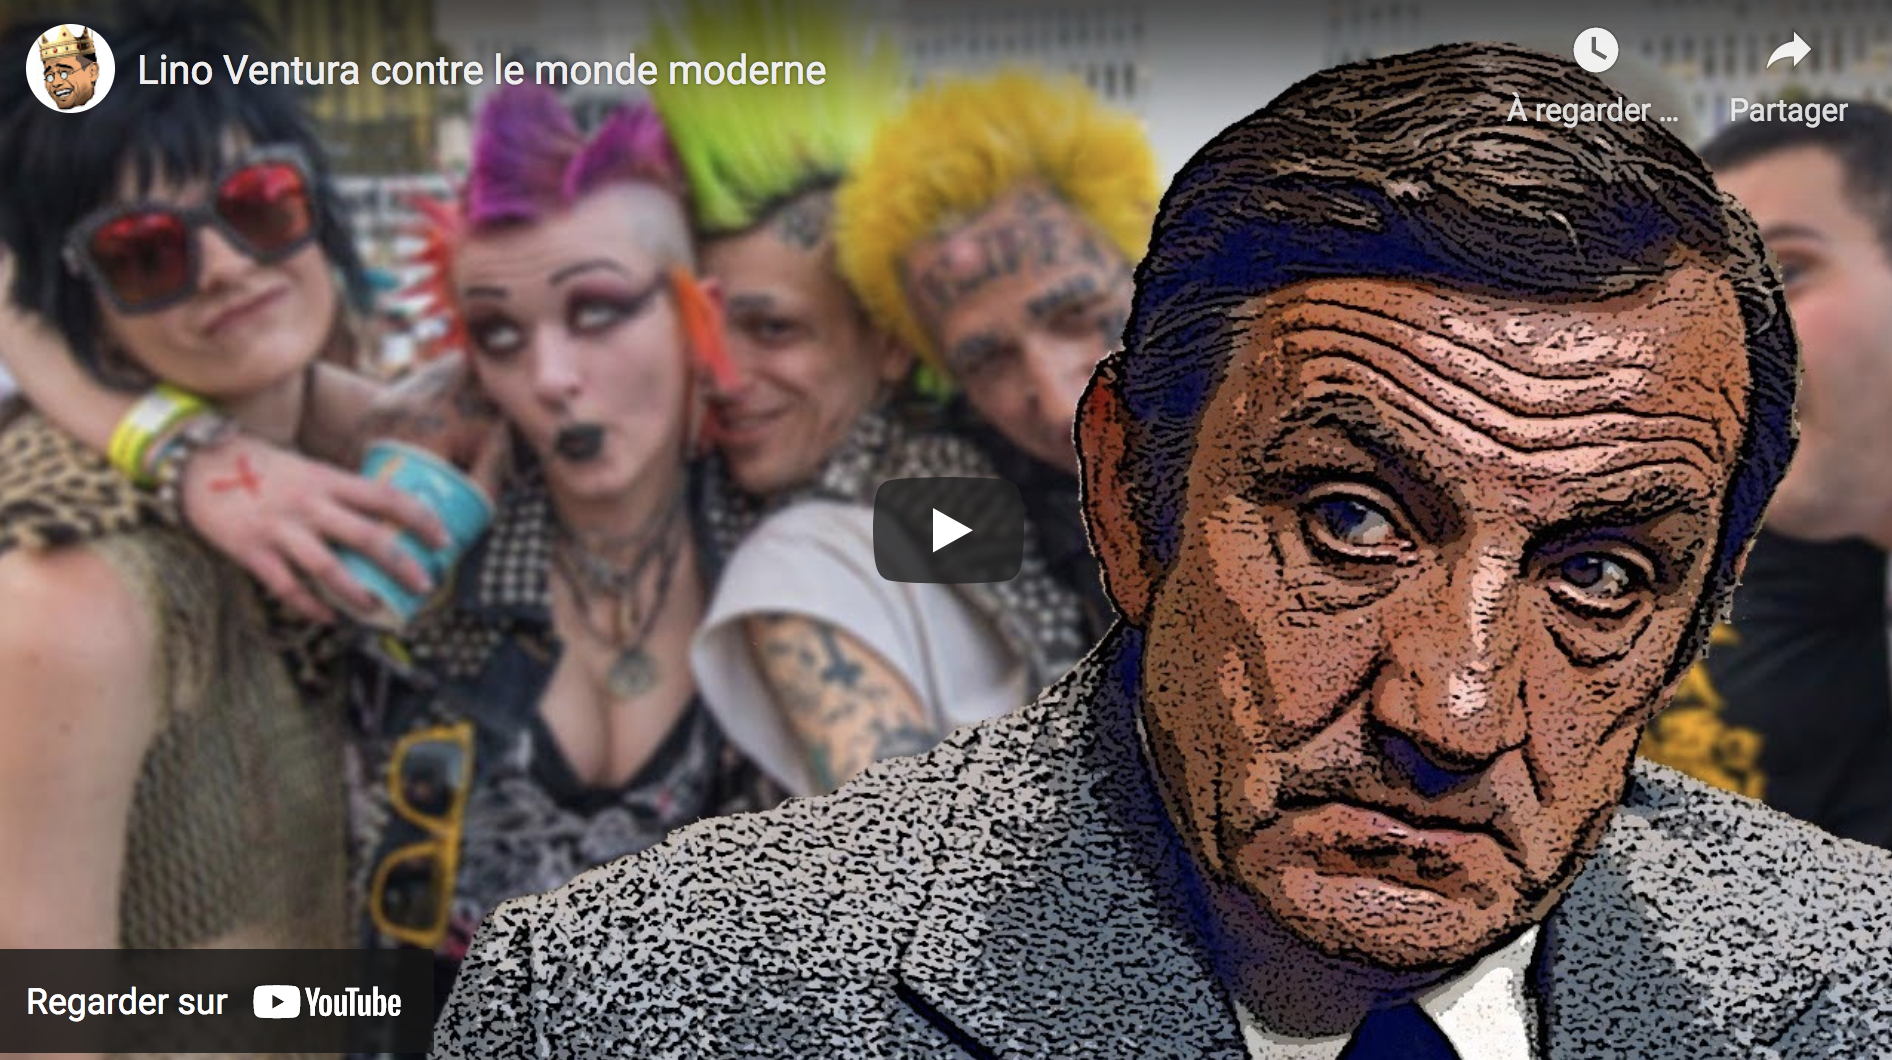 Lino Ventura contre le monde moderne (VIDÉO)